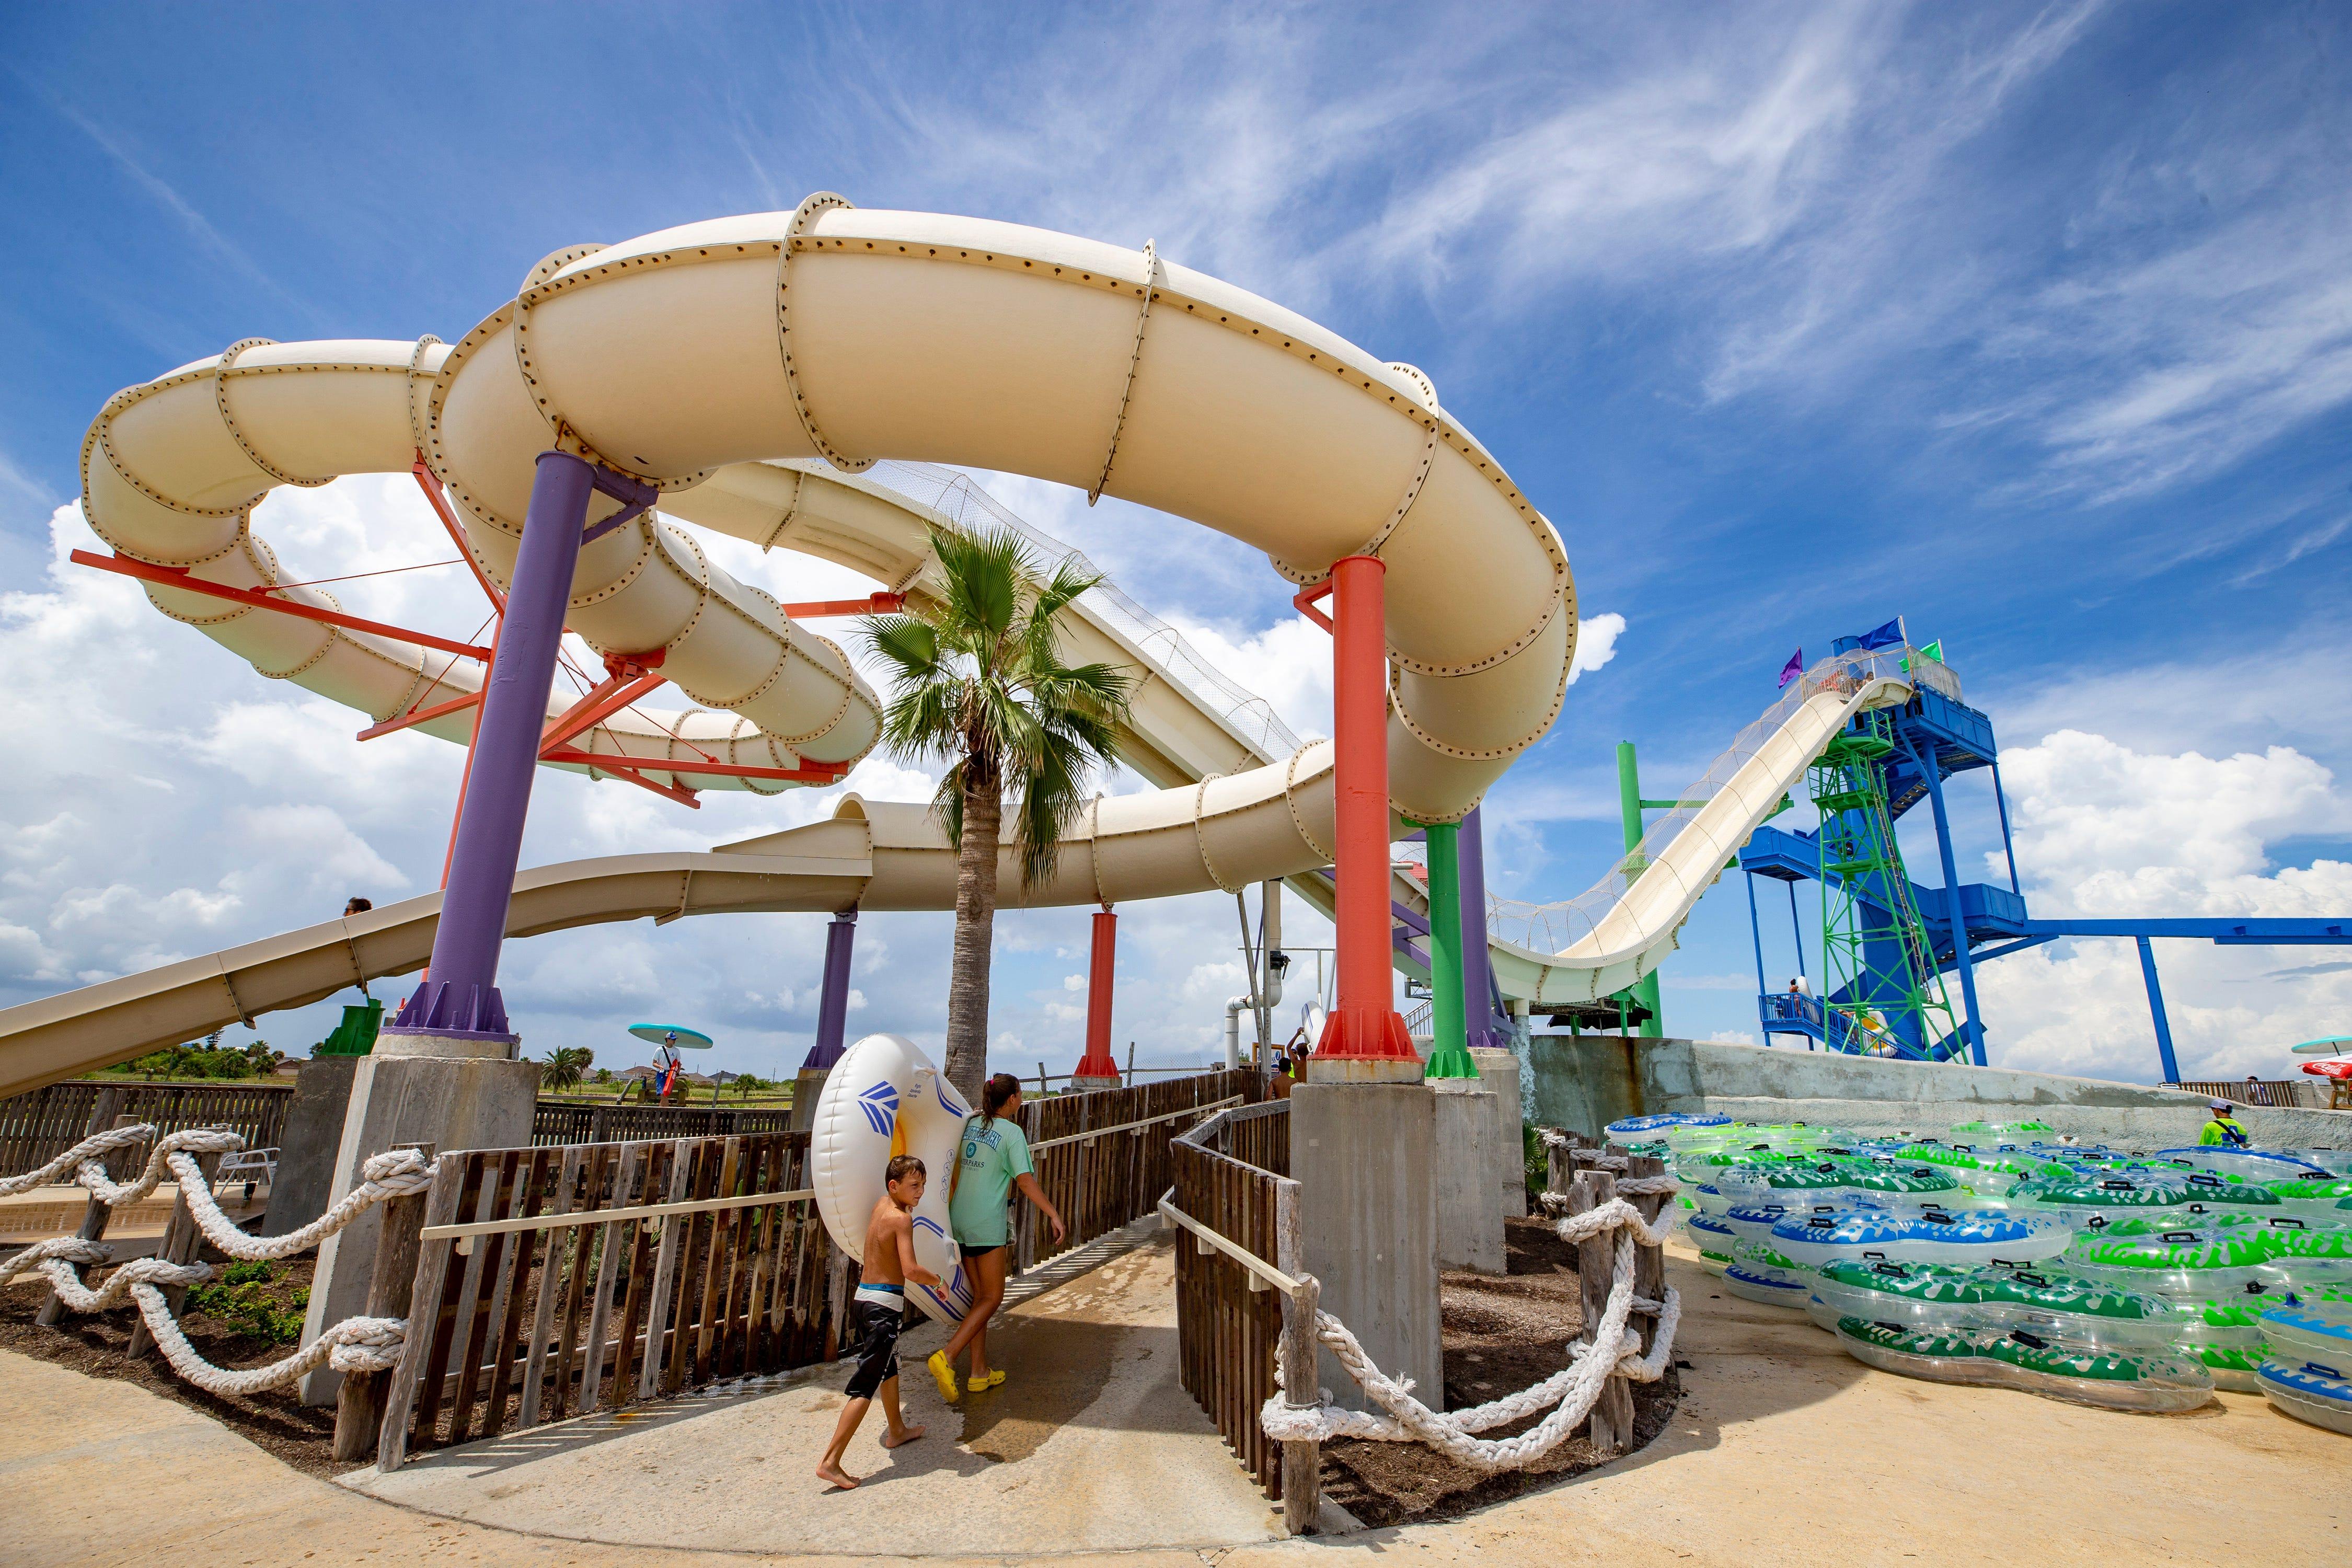 What's new at Waves Resort Schlitterbahn Waterpark in Corpus Christi